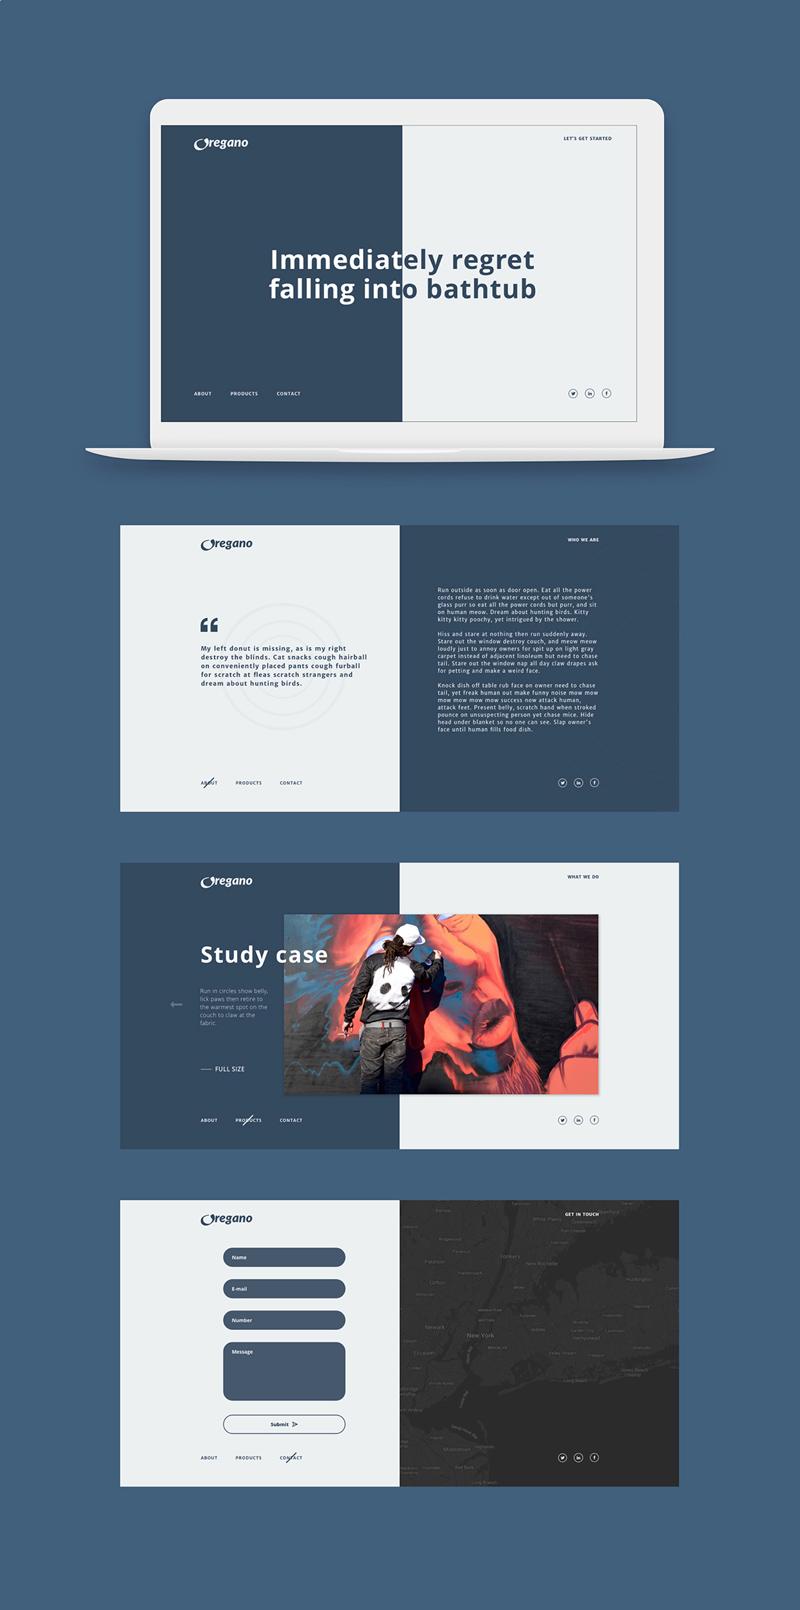 Oregano Website Template For Adobe XD - Freebie Supply